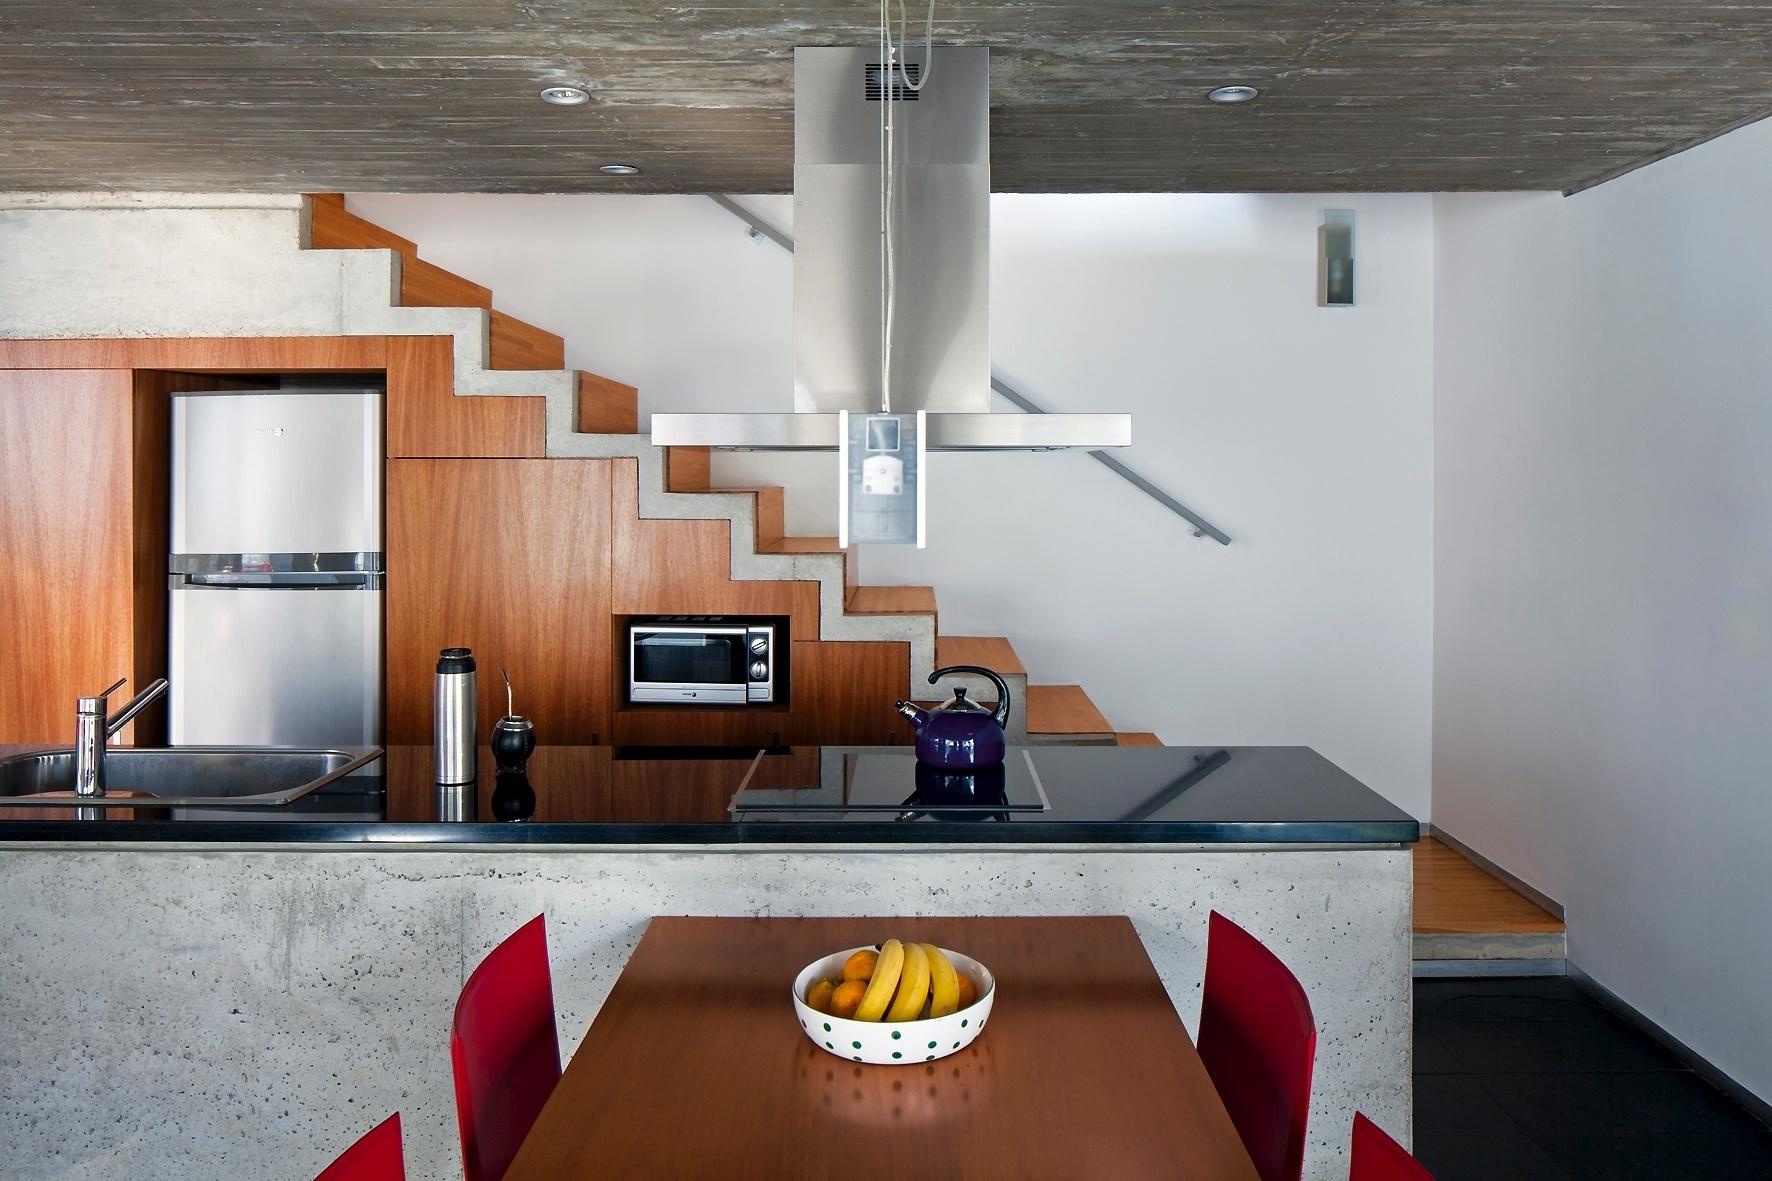 o-fundo-do-terreno-sul-concentra-circulacao-escadas-para-o-pavimento-superior-intimo-e-encaixa-a-cozinha-embutindo-marcenaria-para-armarios-forno-e-geladeira-sob-os-degra